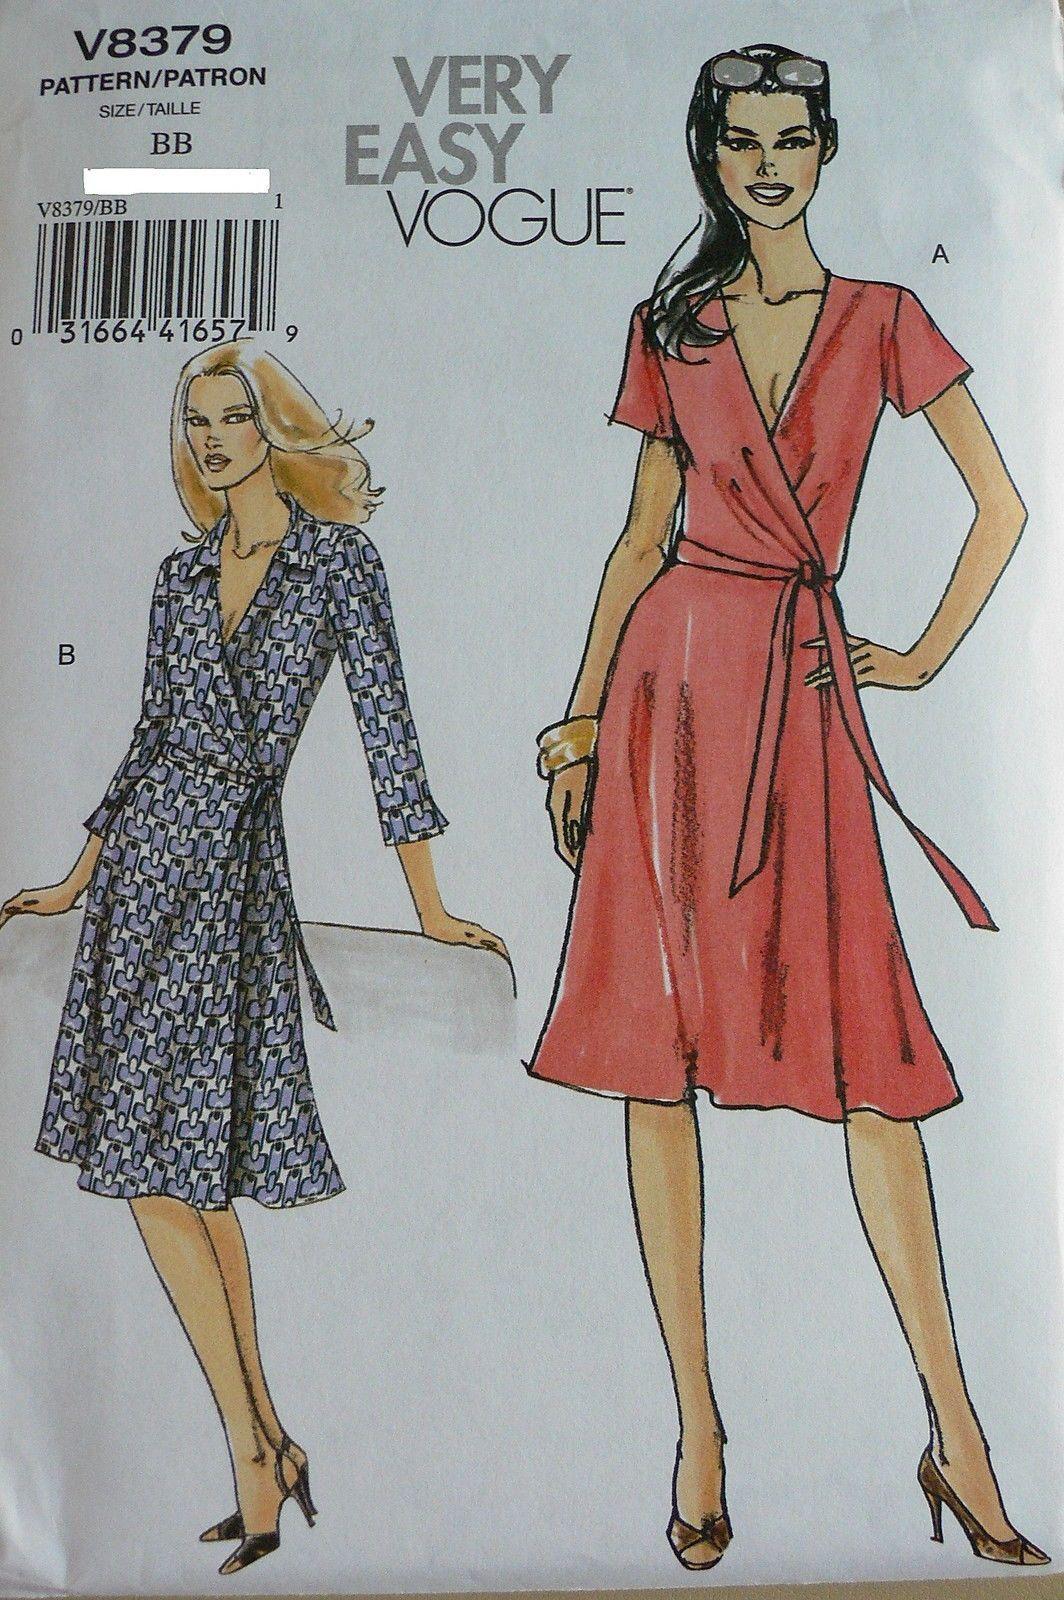 Very Easy Vogue V8379 Misses Wrap Front Dress Sewing Pattern Miss Plus Sz 8 22 Wrap Dress Sewing Patterns Wrap Dress Pattern Dress Sewing Patterns [ 1600 x 1064 Pixel ]